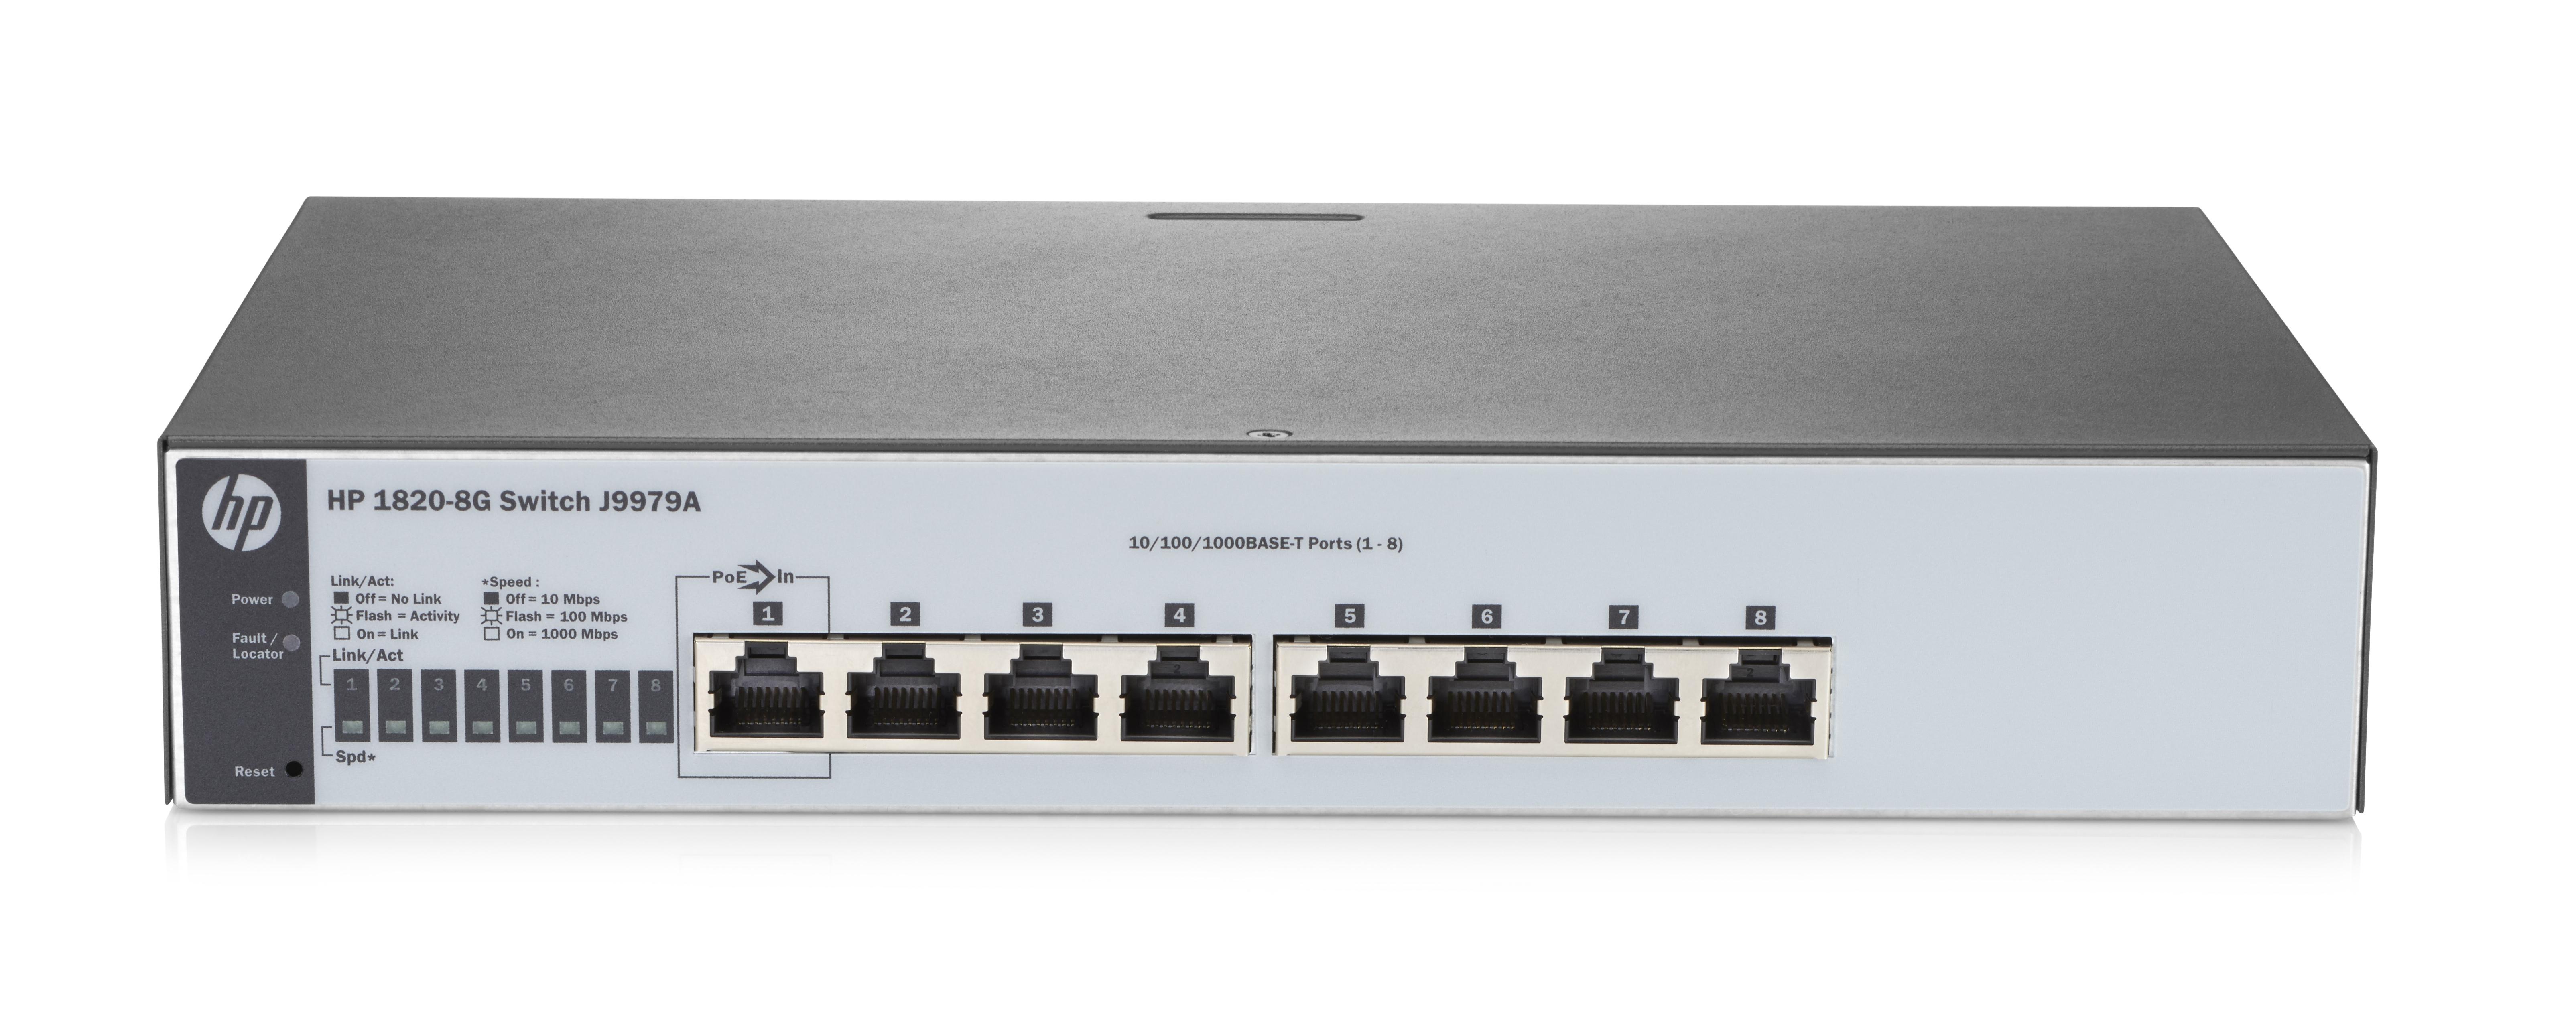 HP Enterprise 18208G Managed L2 Gigabit Ethernet (10/100/1000) Full duplex Rack mounting 1U